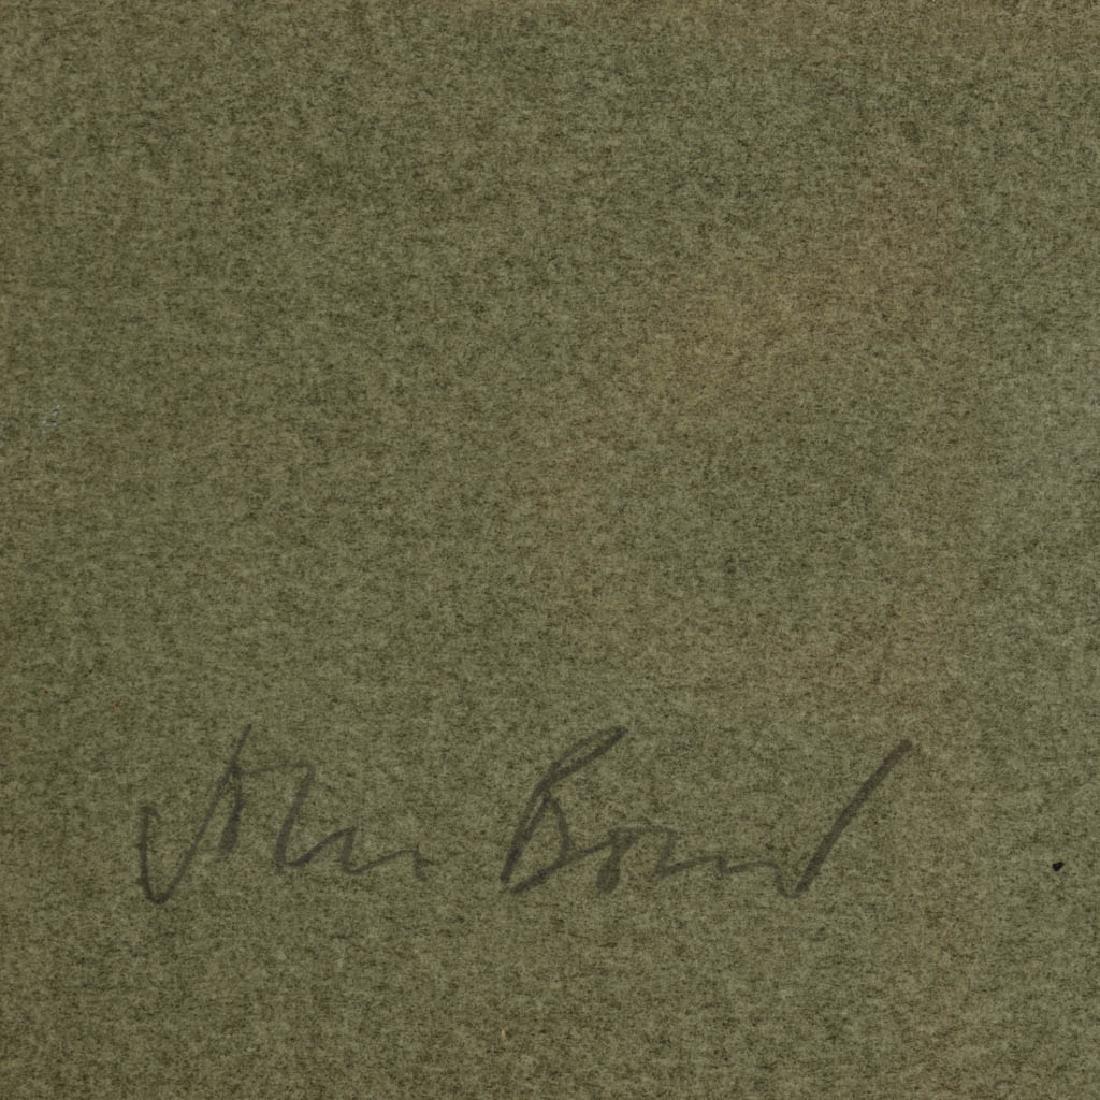 JOHN BOND (BRITISH, B. 1945) LANDSCAPE PAINTING - 2